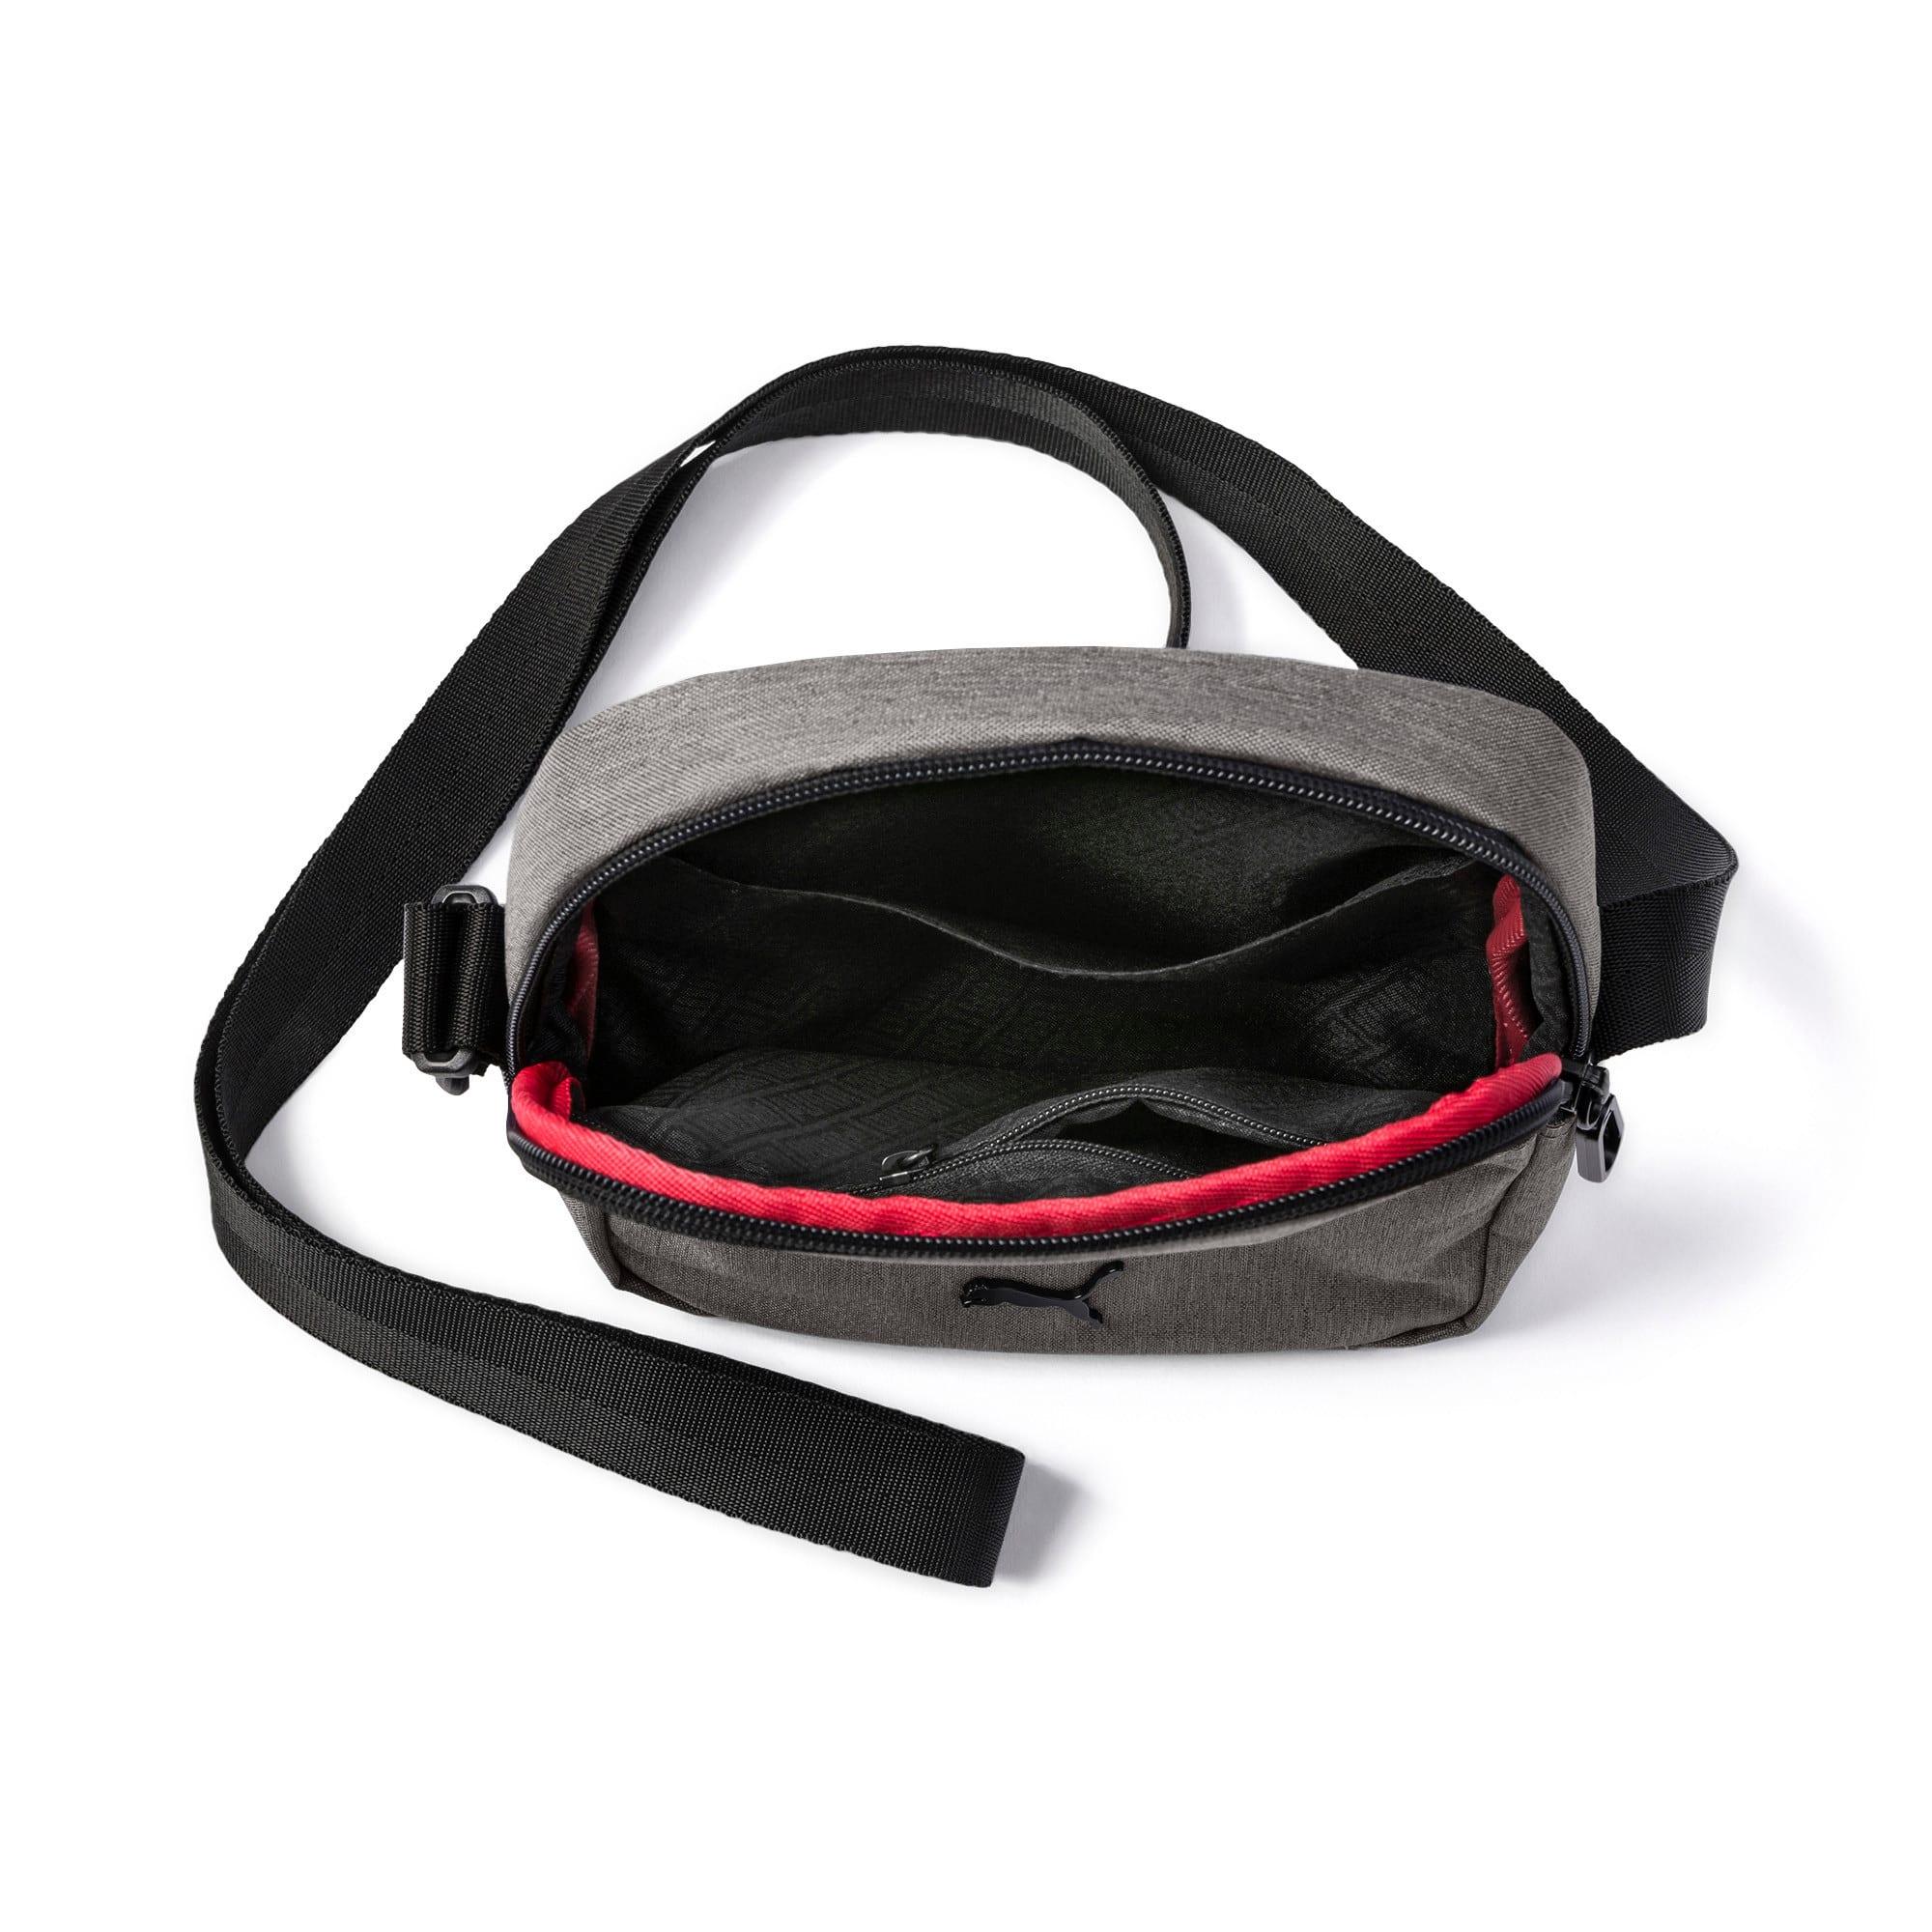 Thumbnail 4 of Ferrari Lifestyle Portable Bag, Charcoal Gray, medium-IND